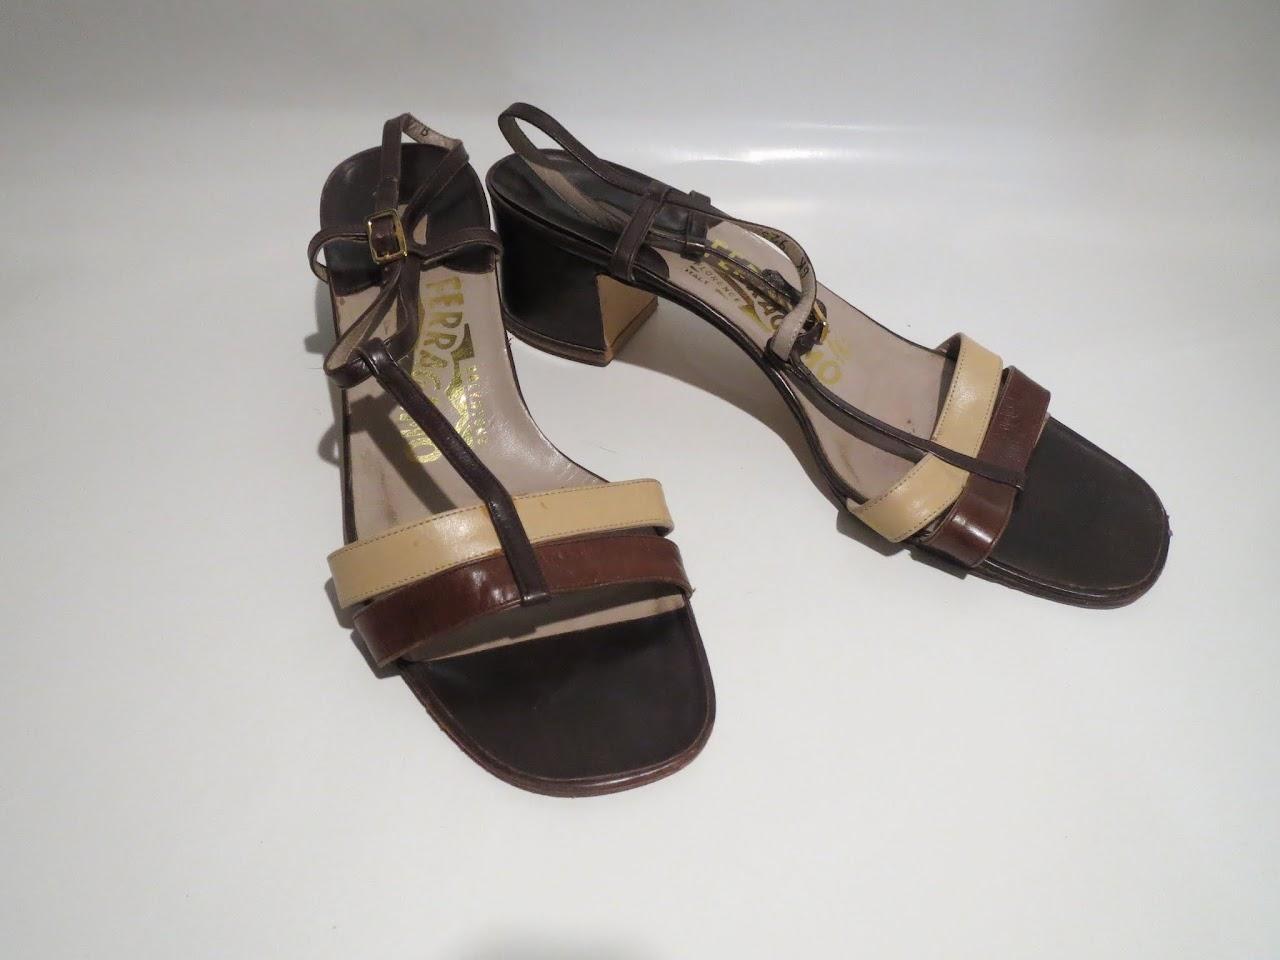 Salvatore Ferragamo Colorblock Sandals